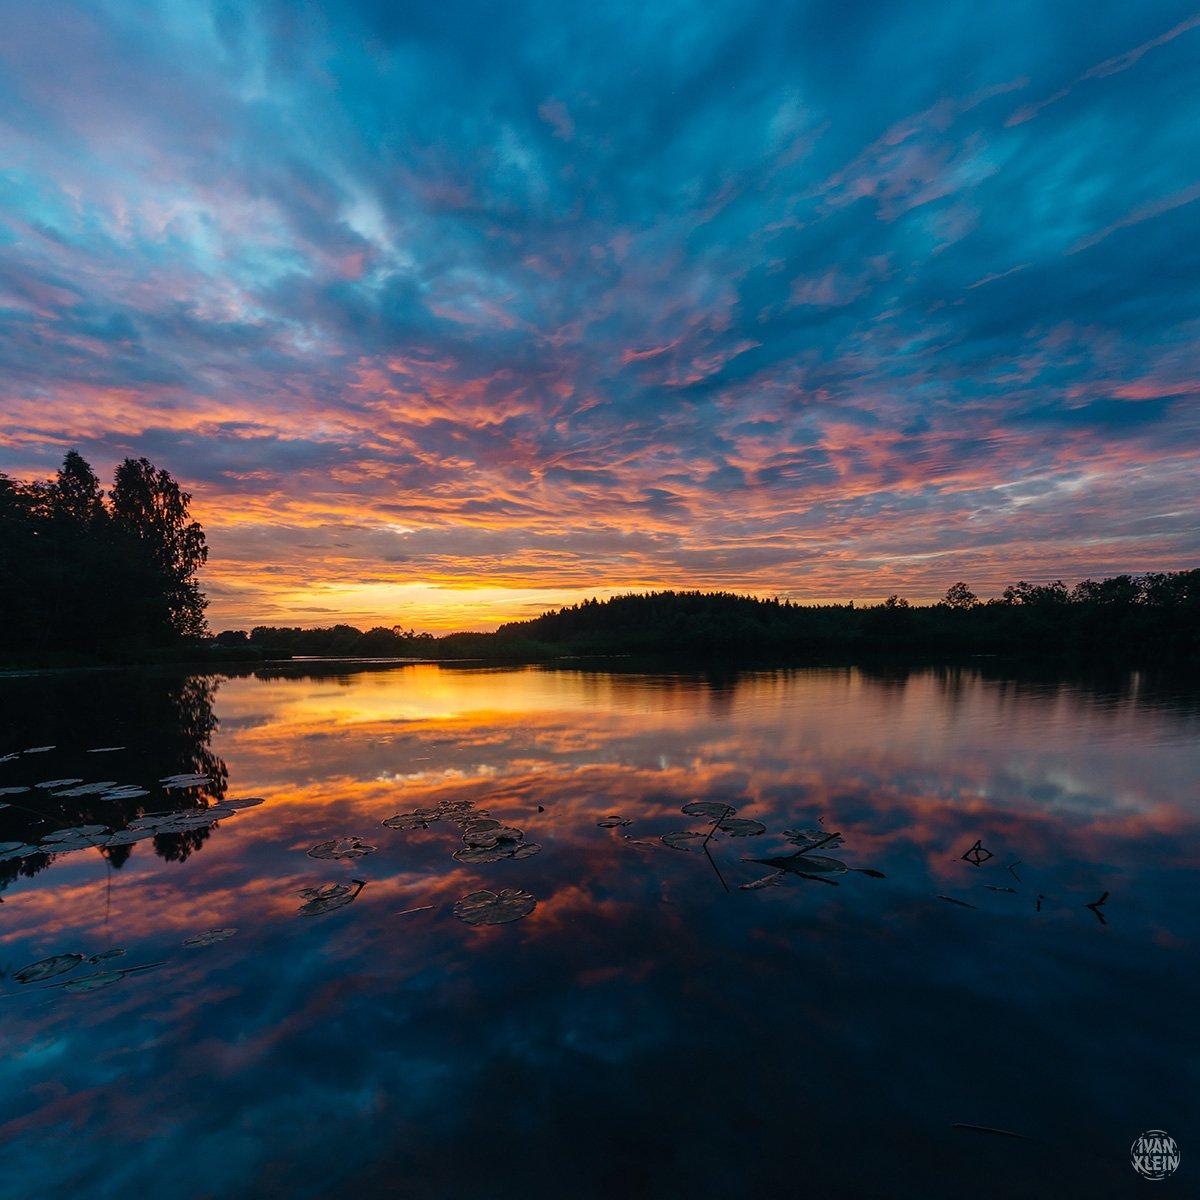 река,закат,речка,вечер,озеро,вода,небо,красиво,природа,пейзаж,отражение,солнце,свет, Иван Клейн